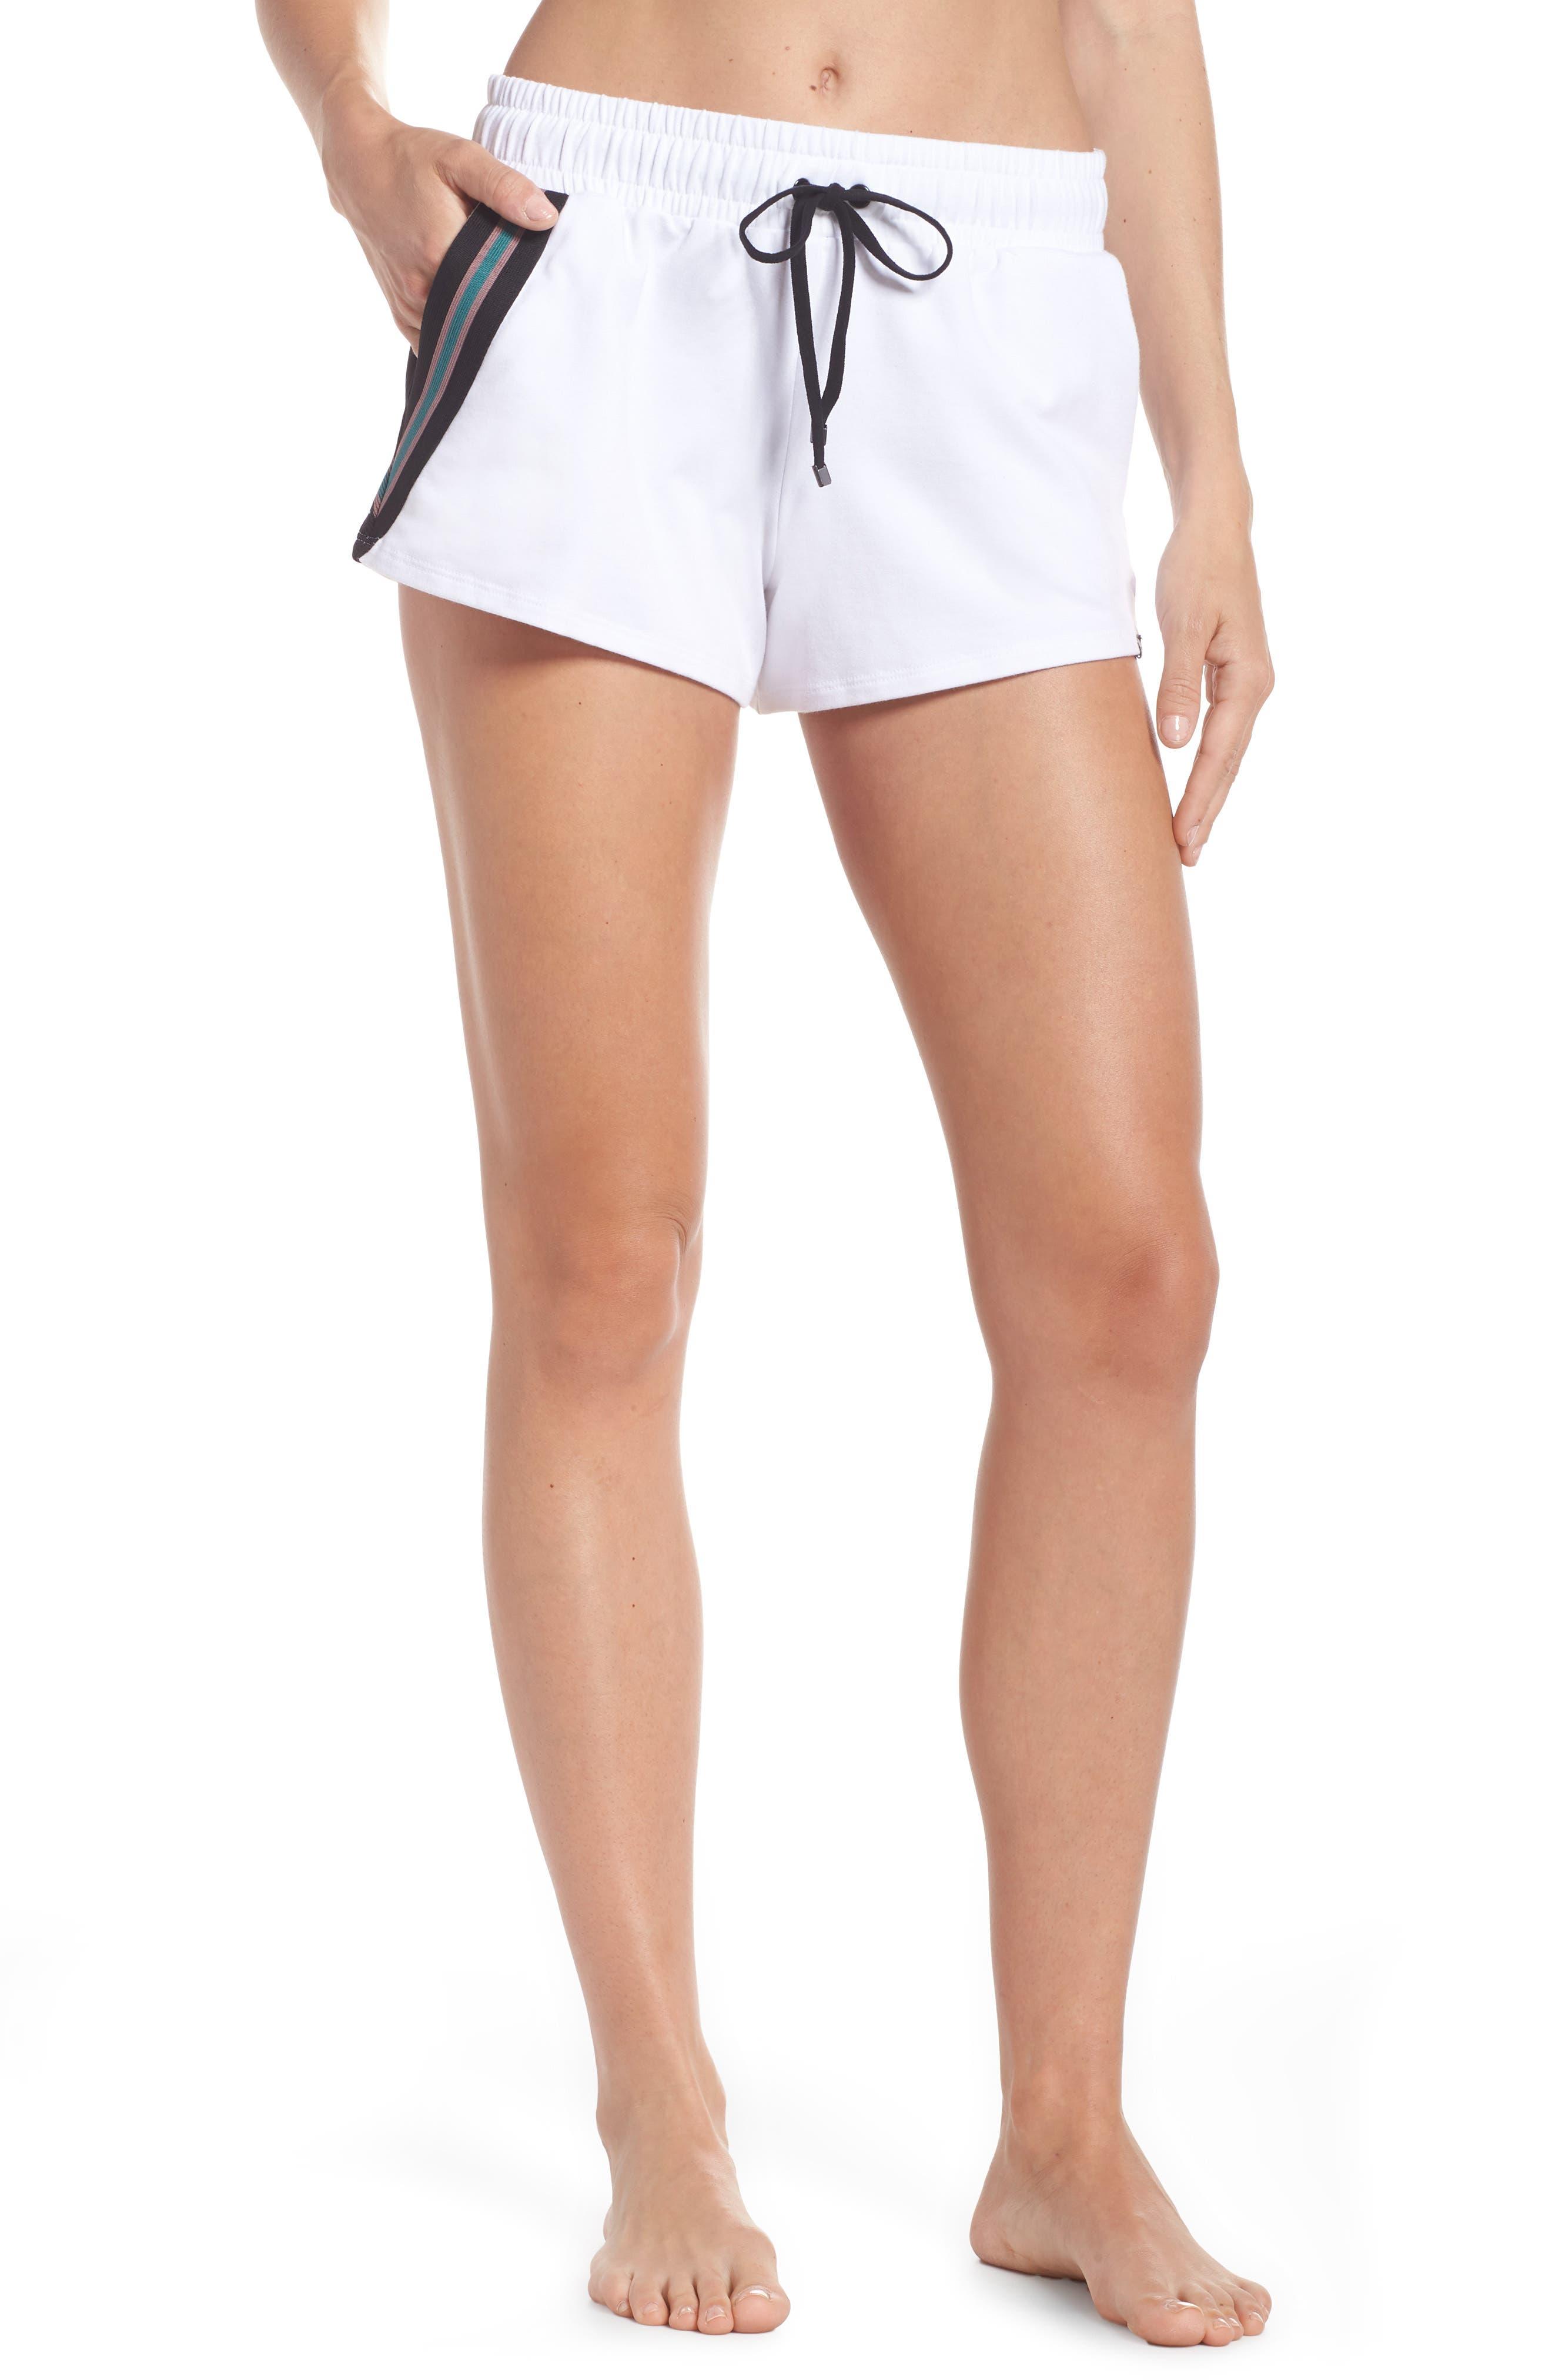 Beam Shorts,                             Main thumbnail 1, color,                             WHITE